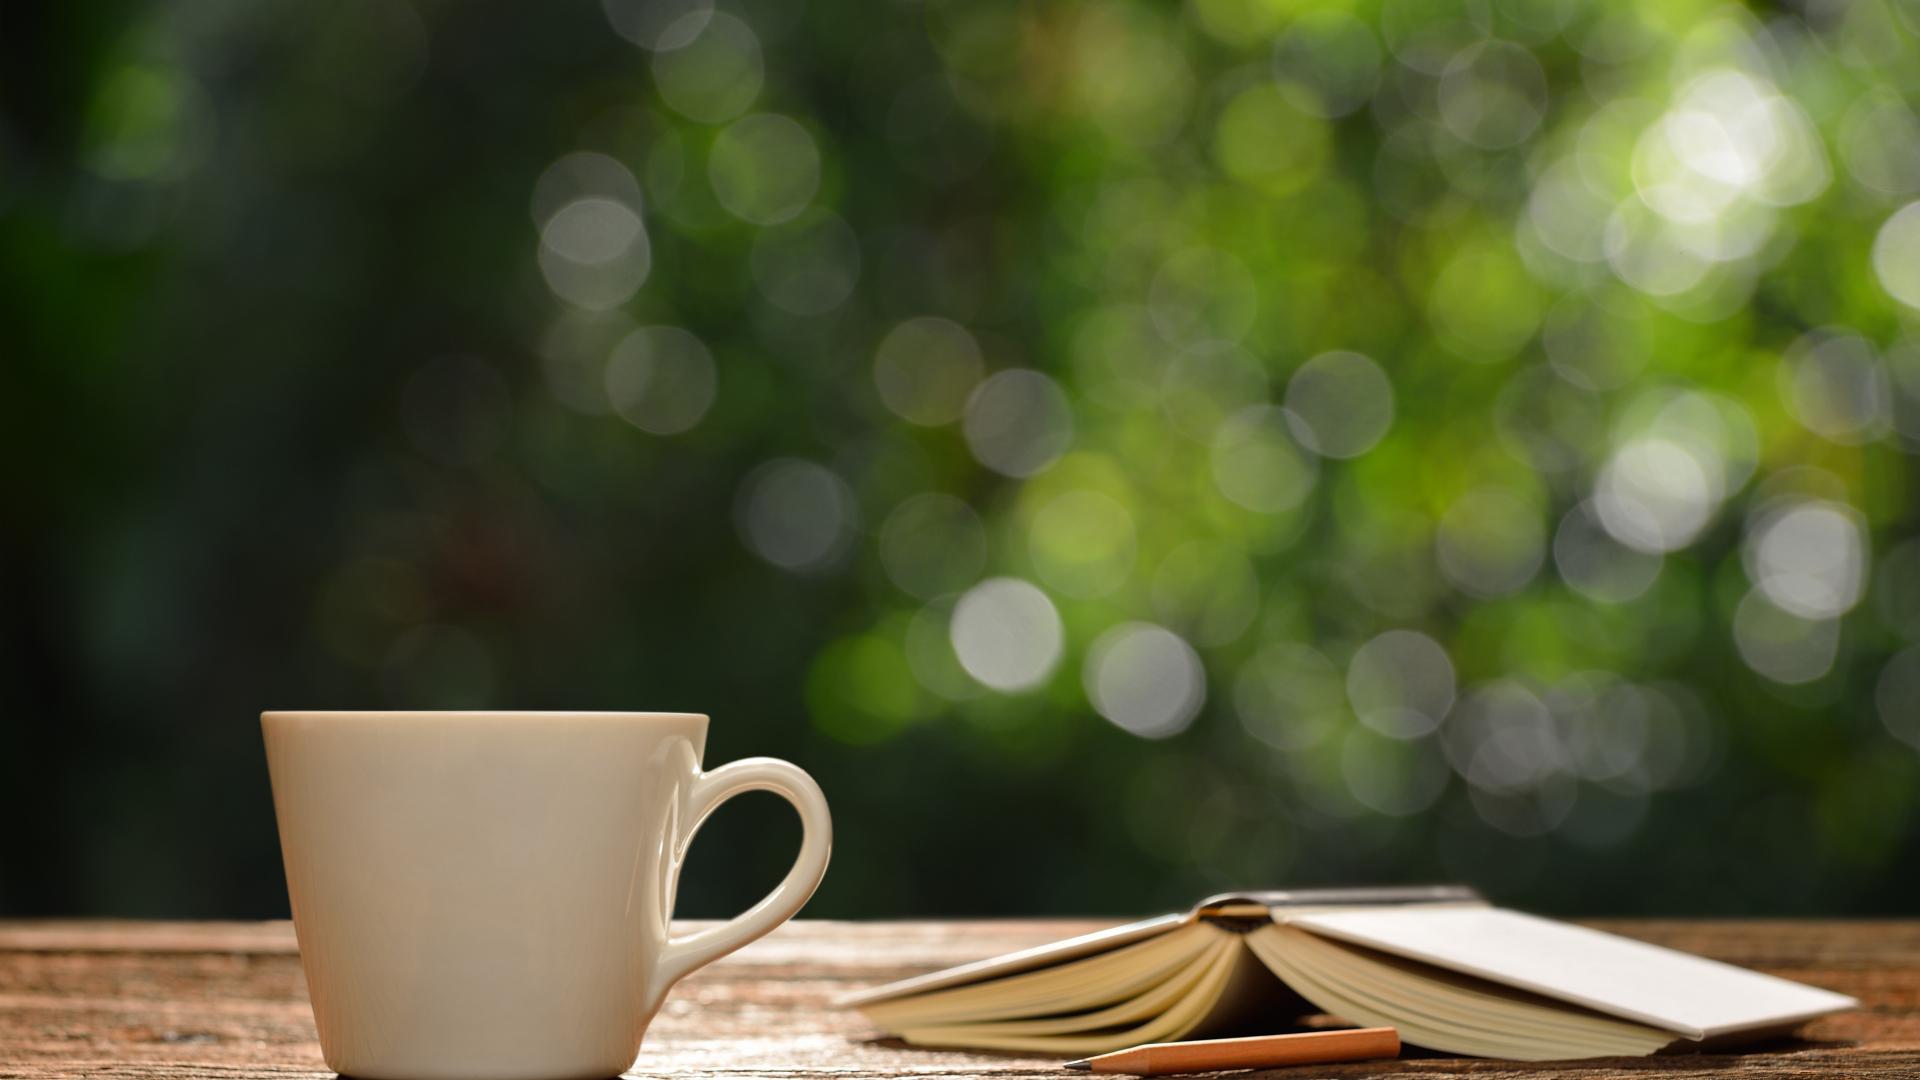 Download 1920x1080 Wallpaper Coffee Cup, Book, Bokeh, 4k, Full Hd, Hdtv, Fhd, 1080p, 1920x1080 ...